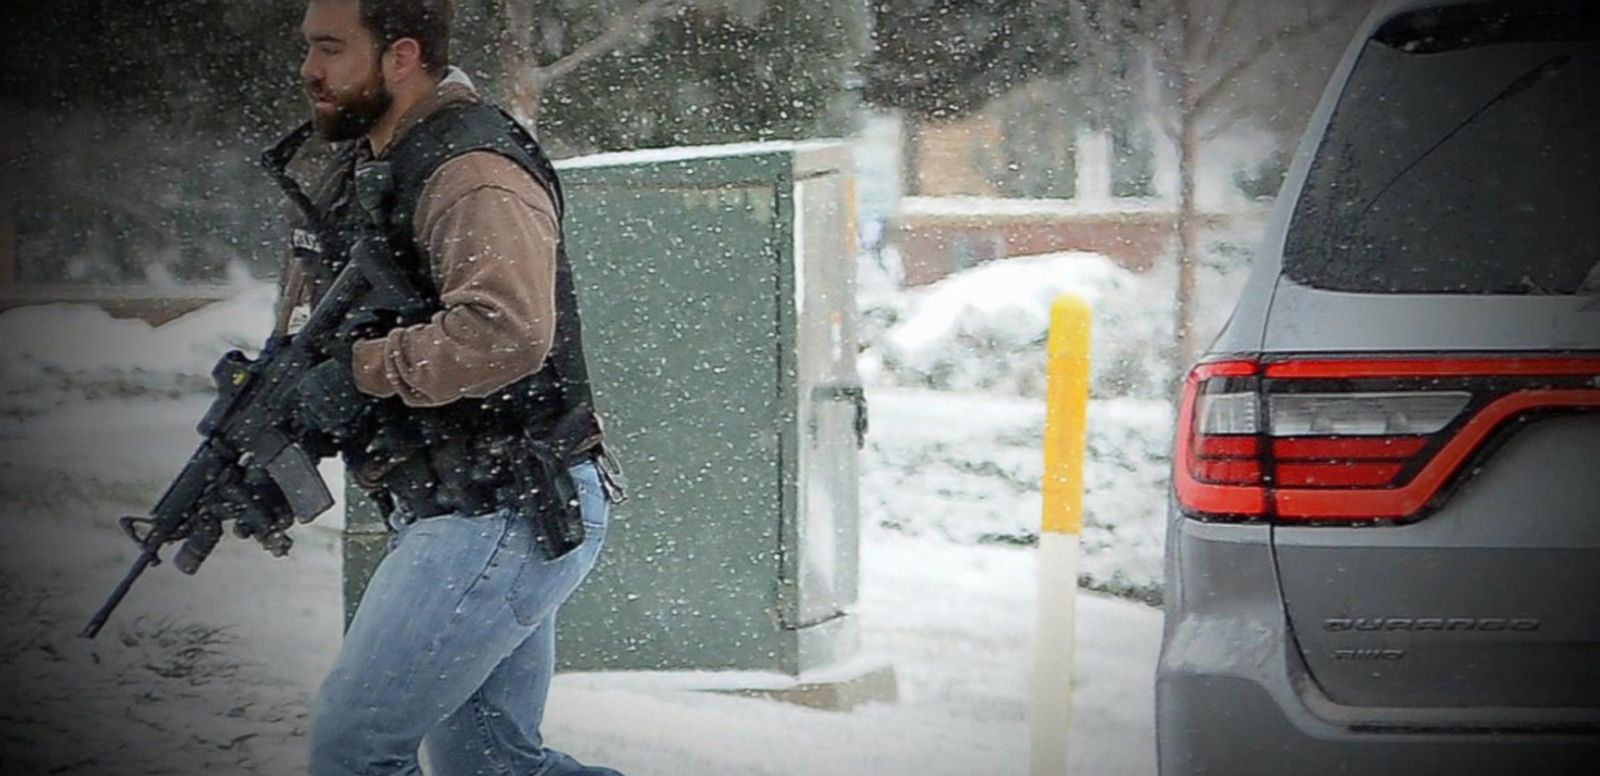 VIDEO: SWAT Team Takes Down Colorado Shooter